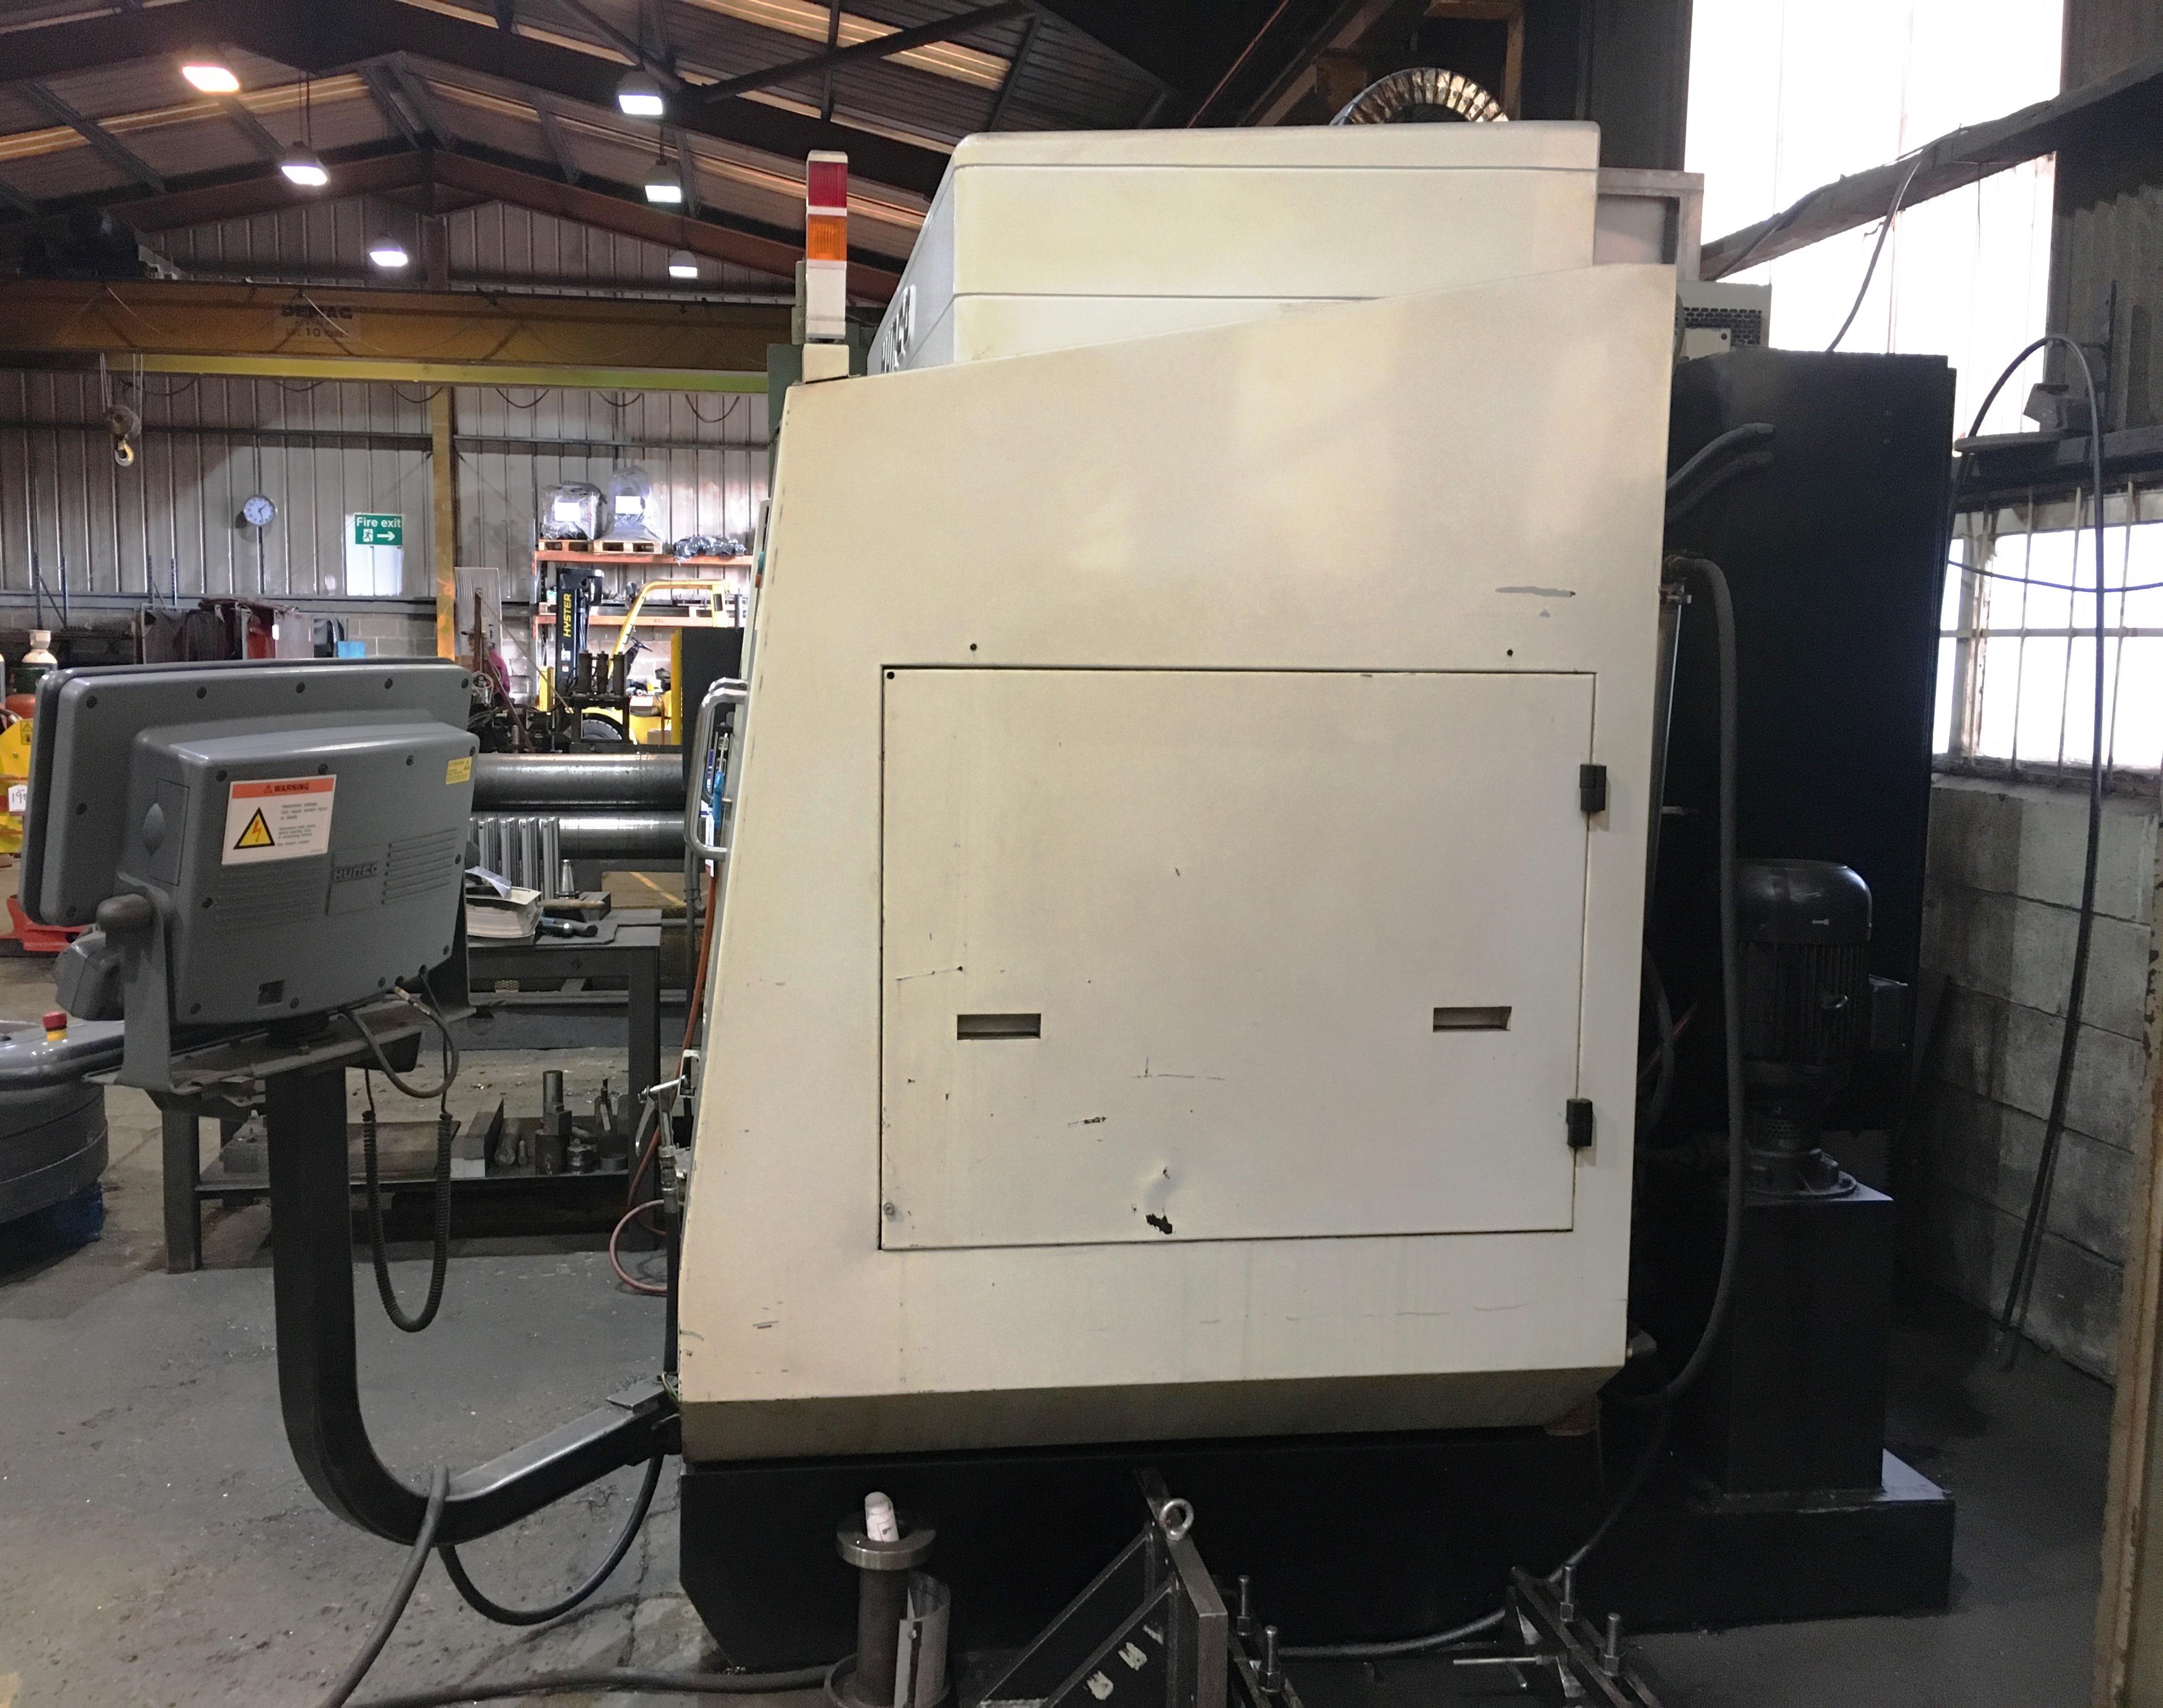 Hurco BMC 4020 HT/M CNC Vertical Machining Centre | YOM: 2000 - Image 10 of 16